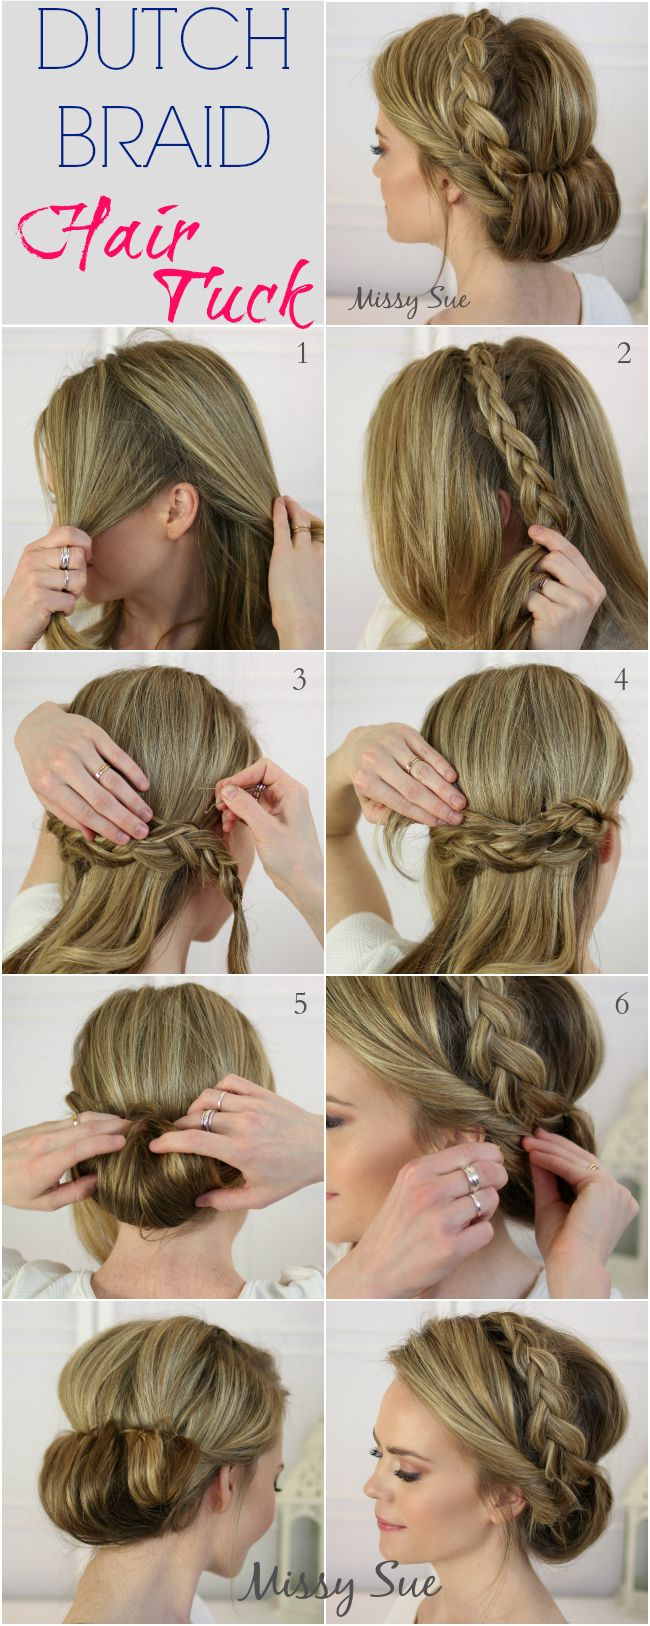 Astonishing 17 Stunning Dutch Braid Hairstyles With Tutorials Pretty Designs Hairstyles For Men Maxibearus